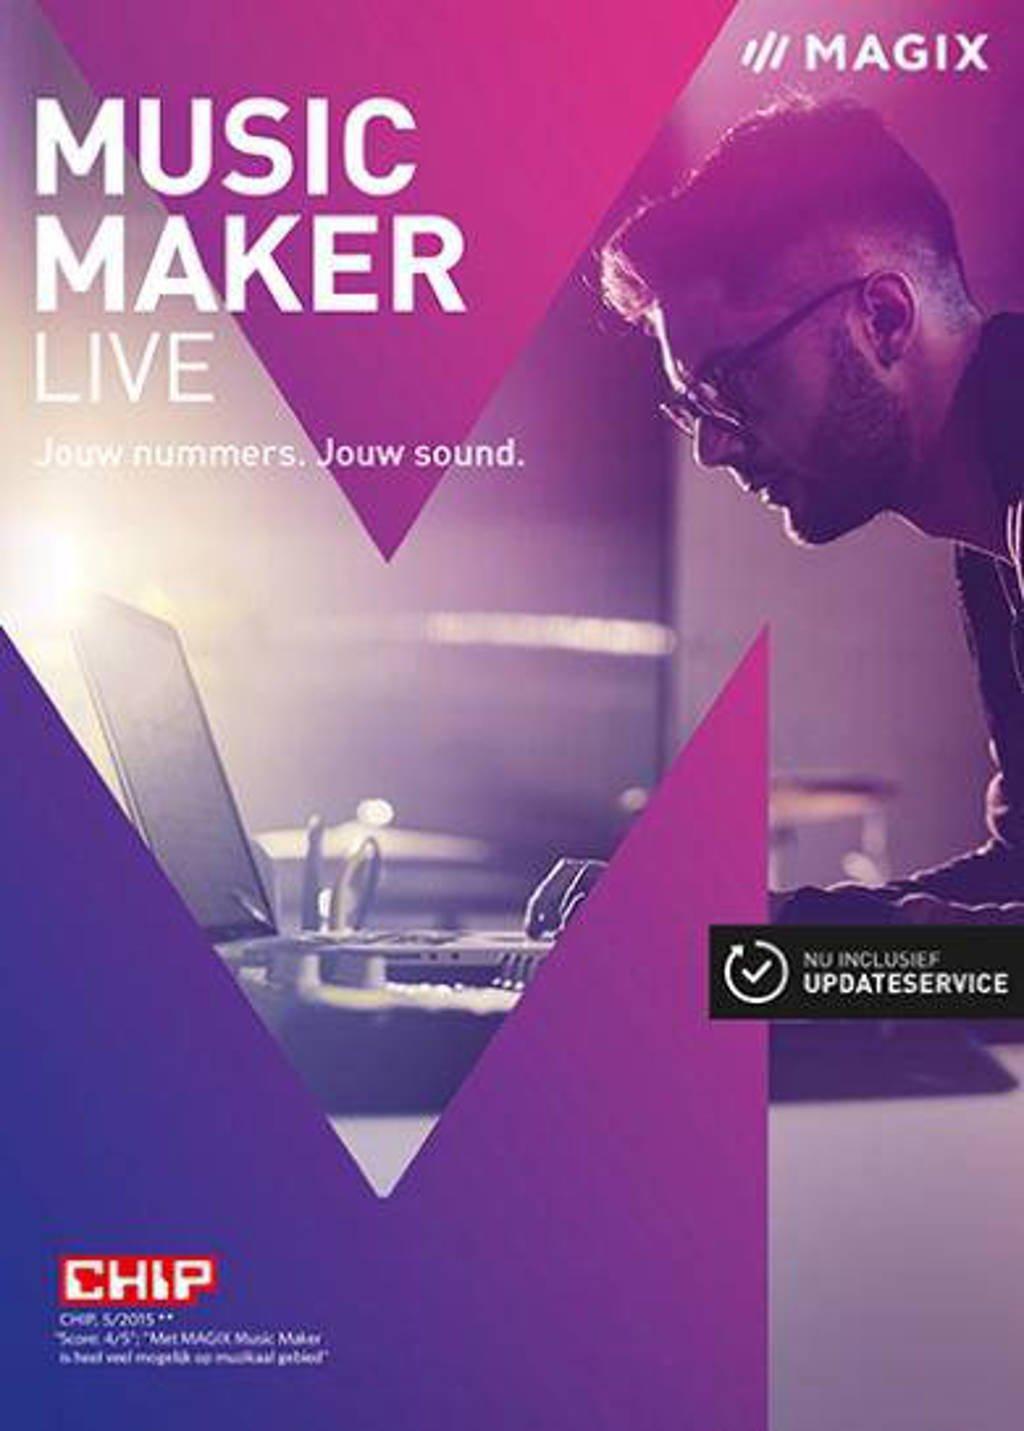 Magix music maker live (PC)